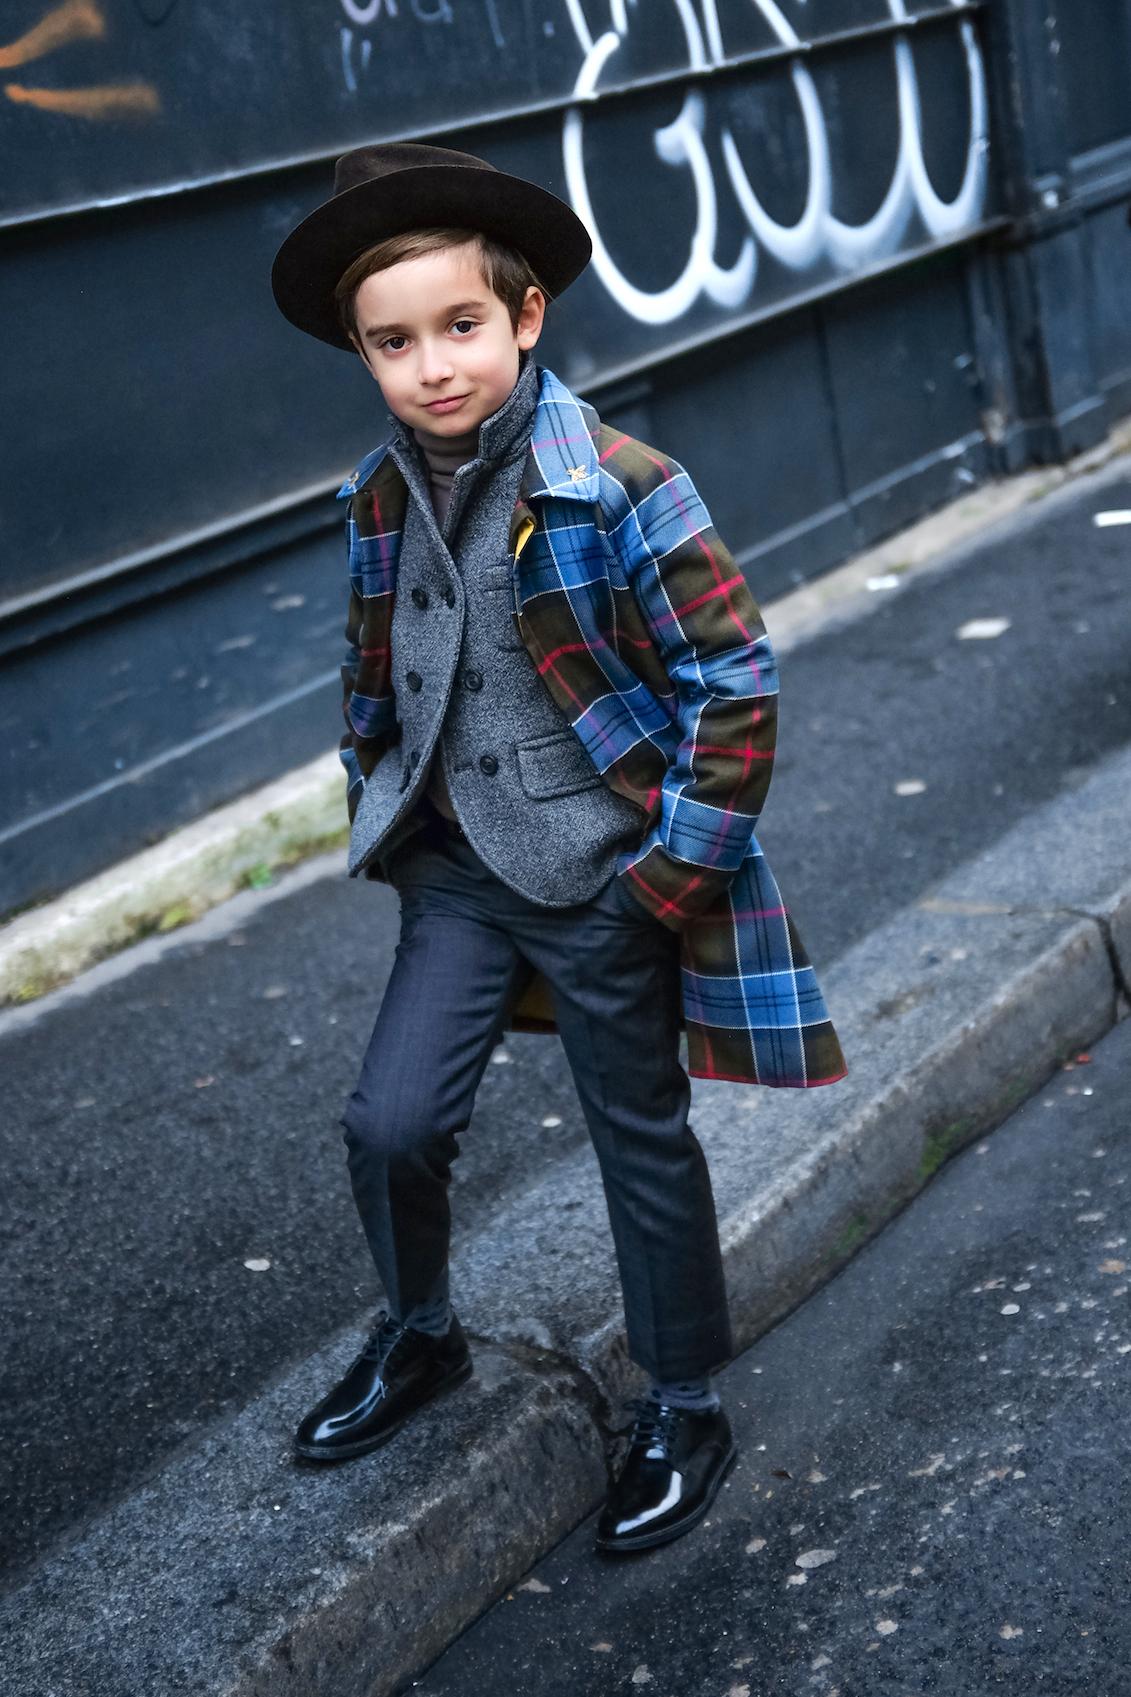 kids_fashion_felicidad_de_lucas_photographer_018.jpg